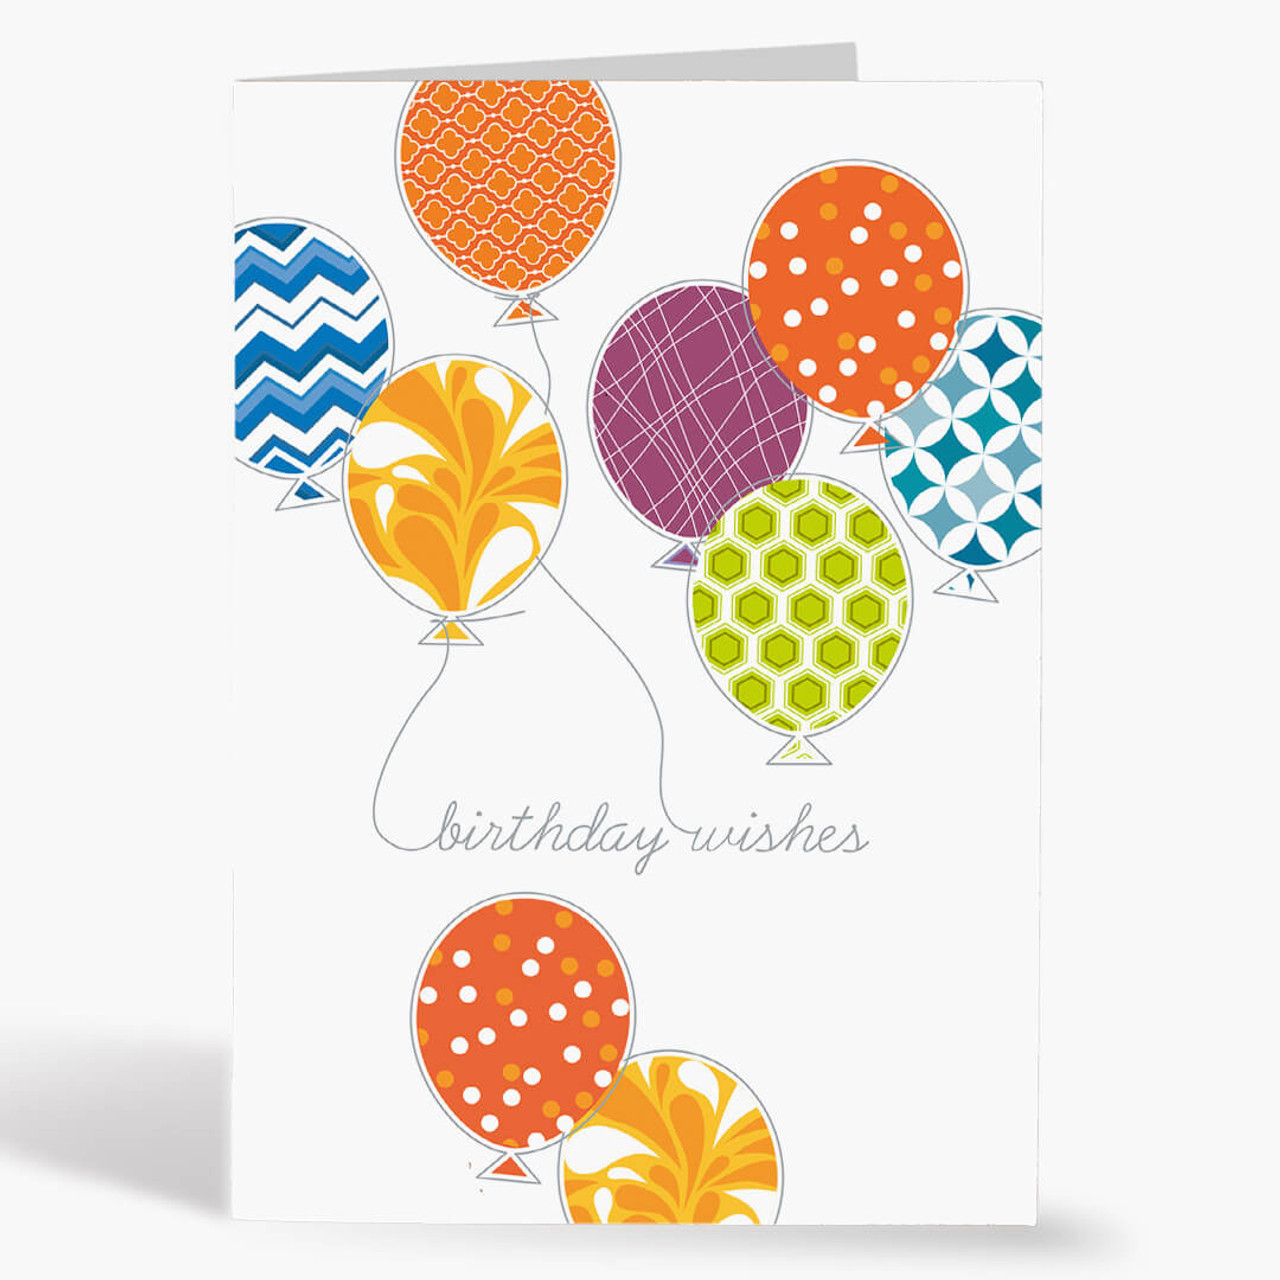 Balloon Wishes Birthday Card